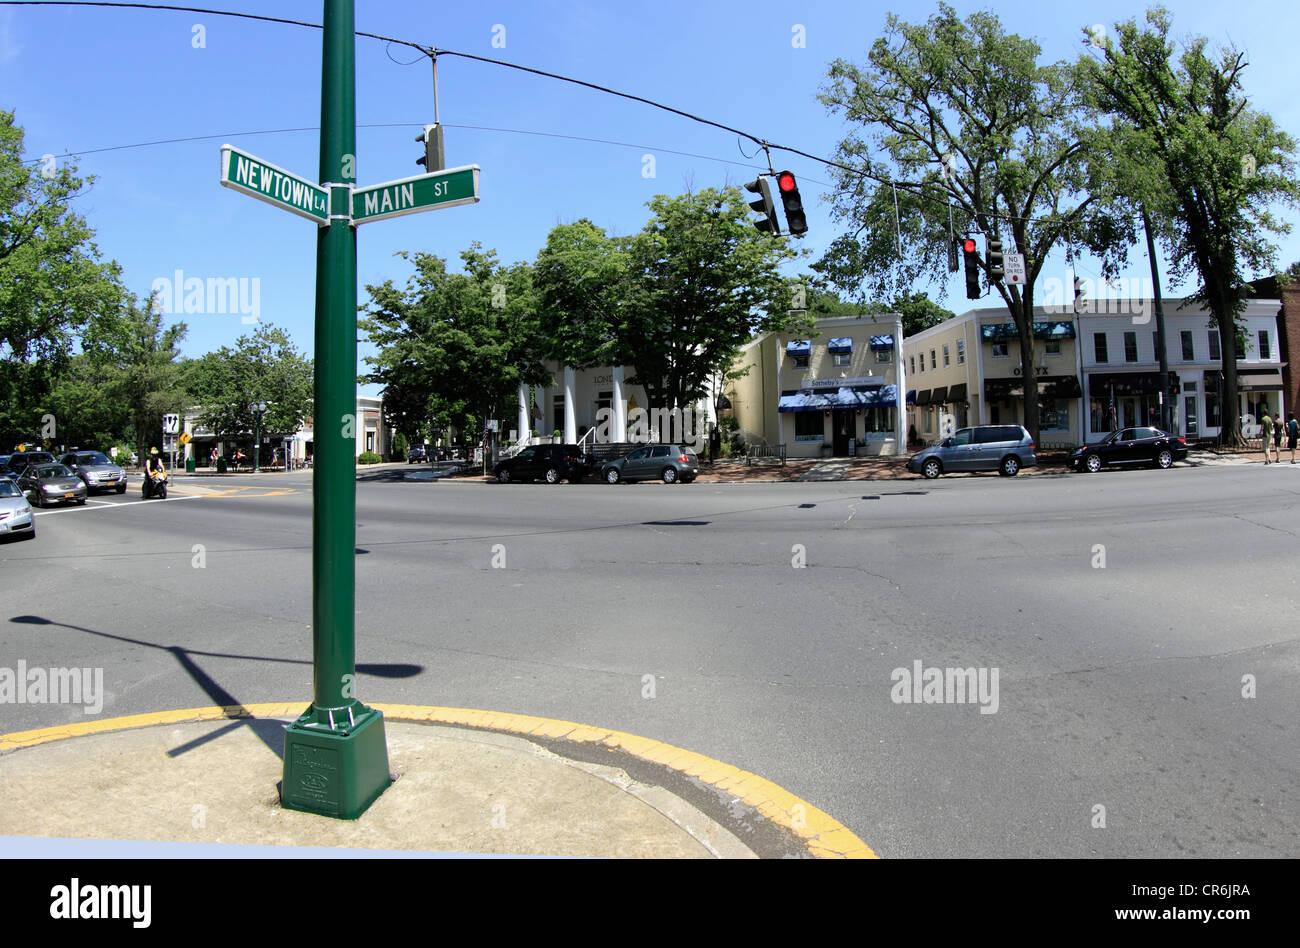 Main St. East Hampton Long Island New York - Stock Image